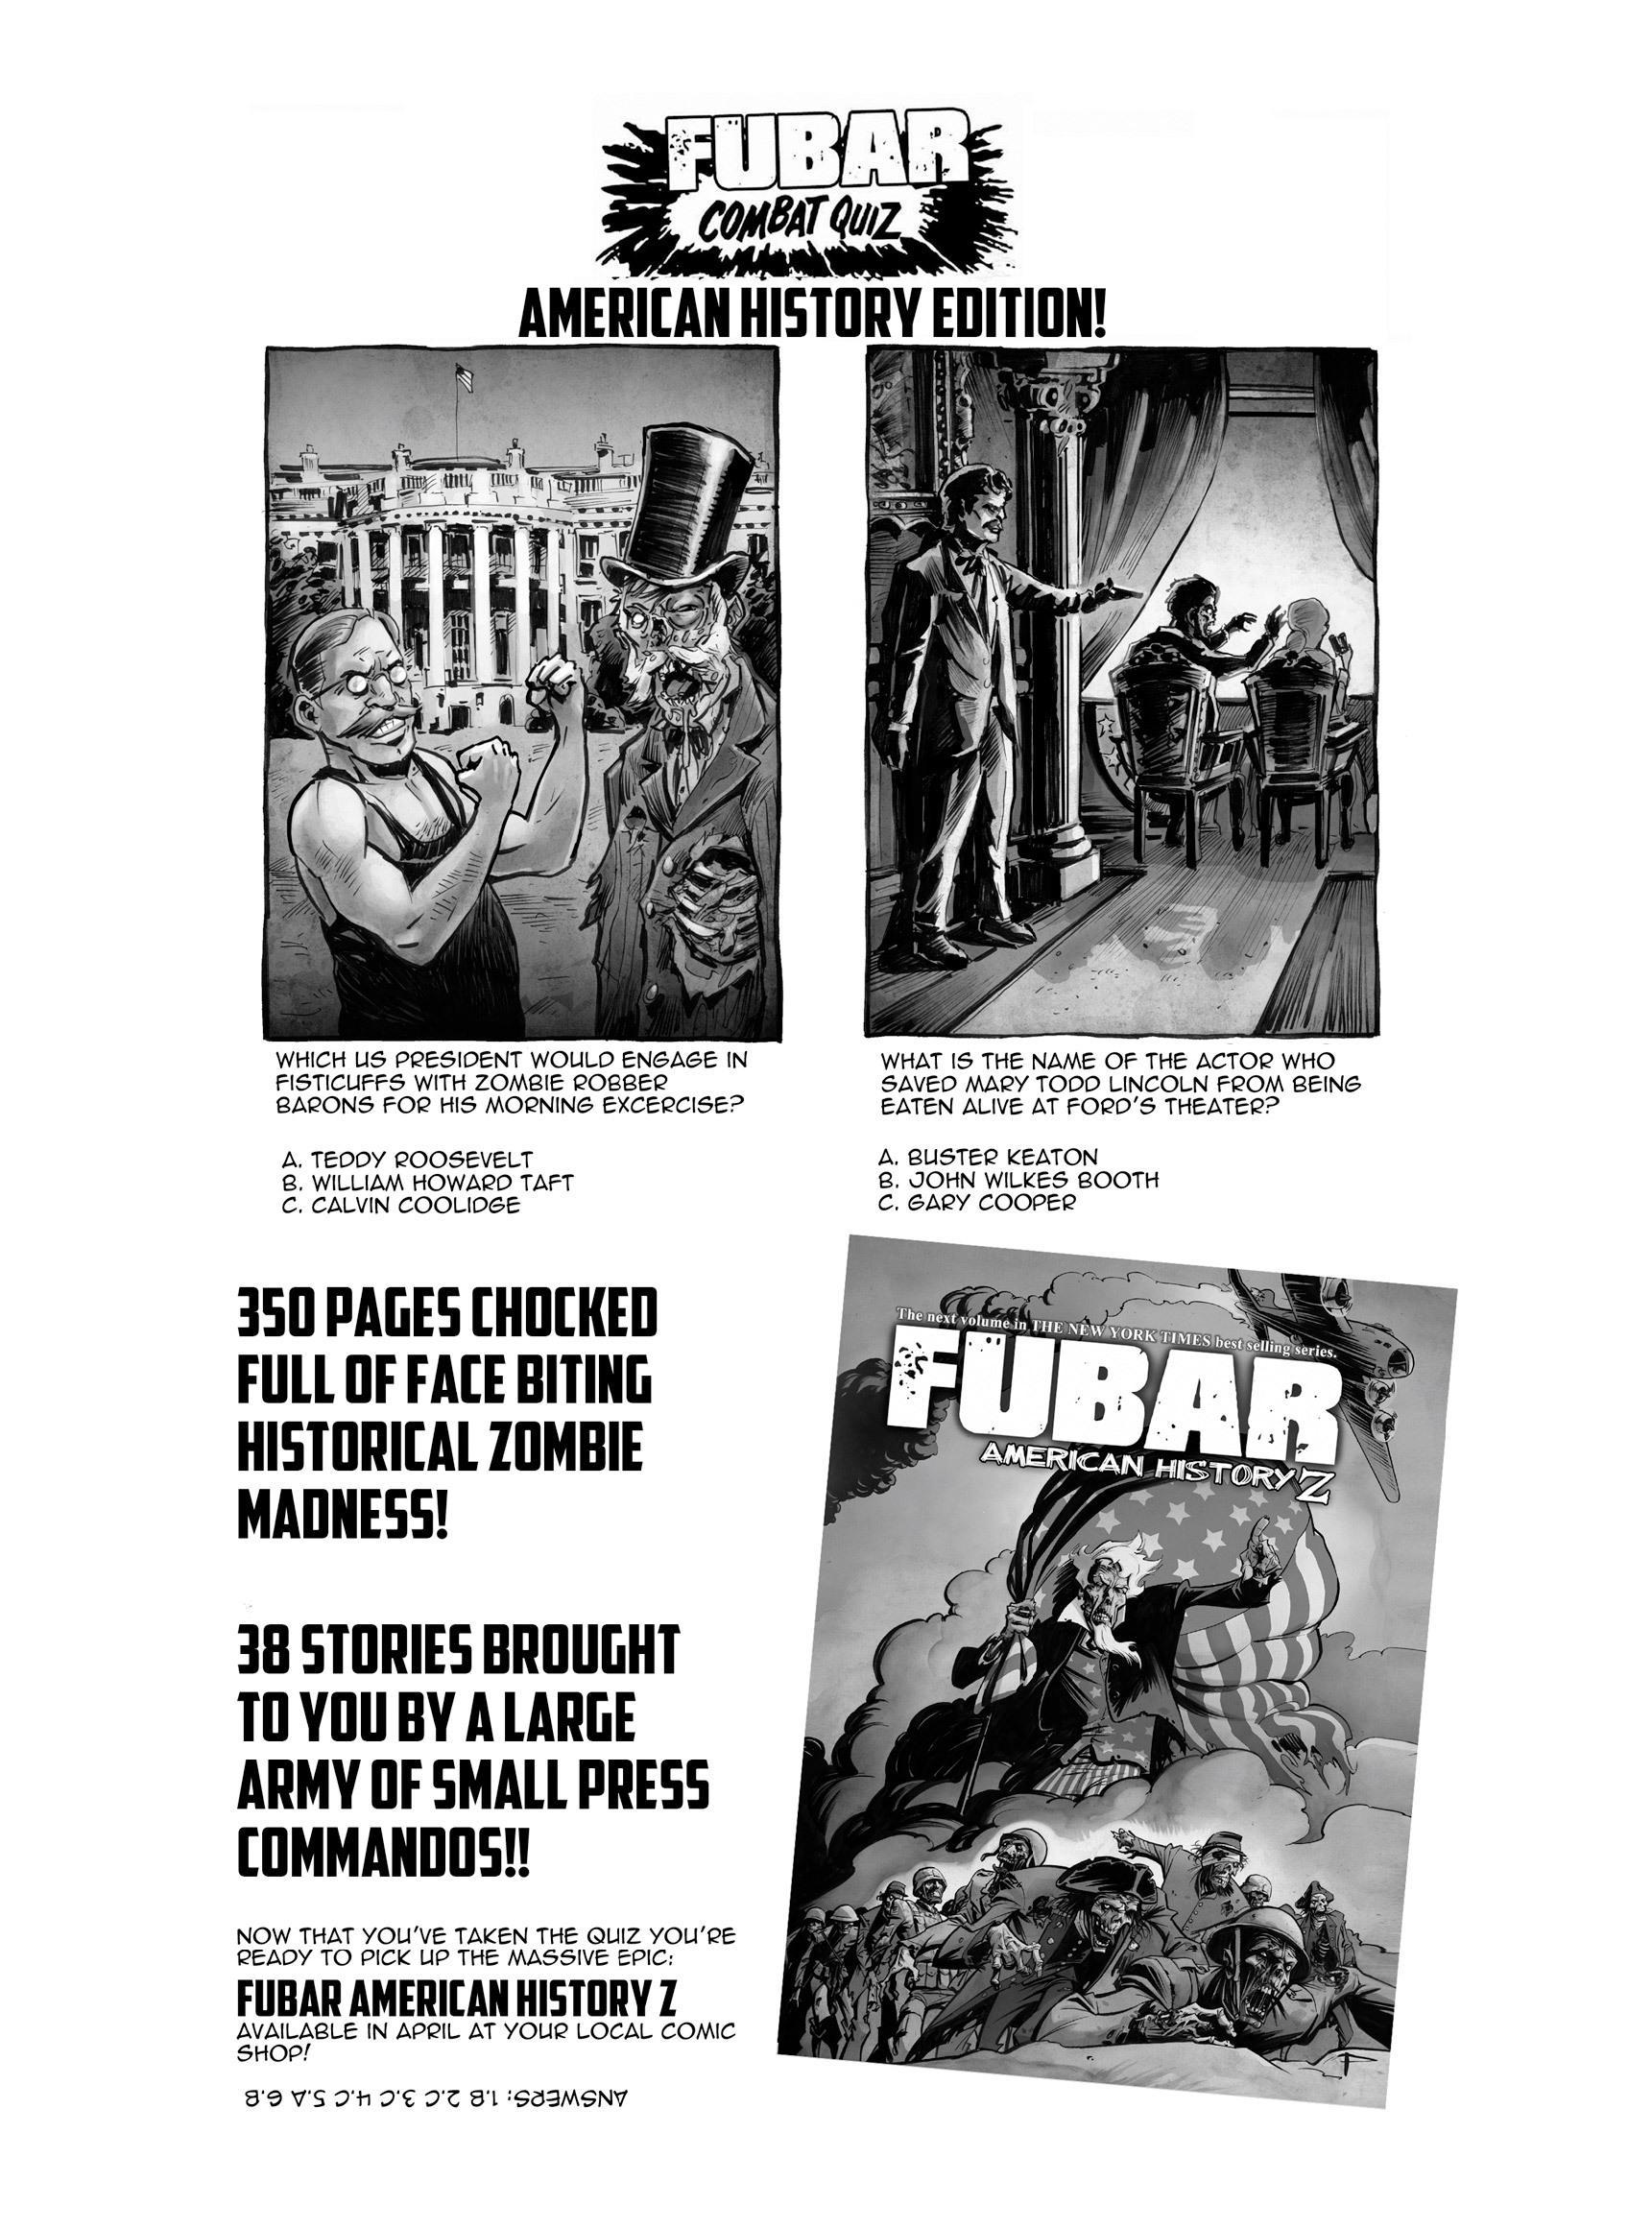 Read online FUBAR comic -  Issue #3 - 389